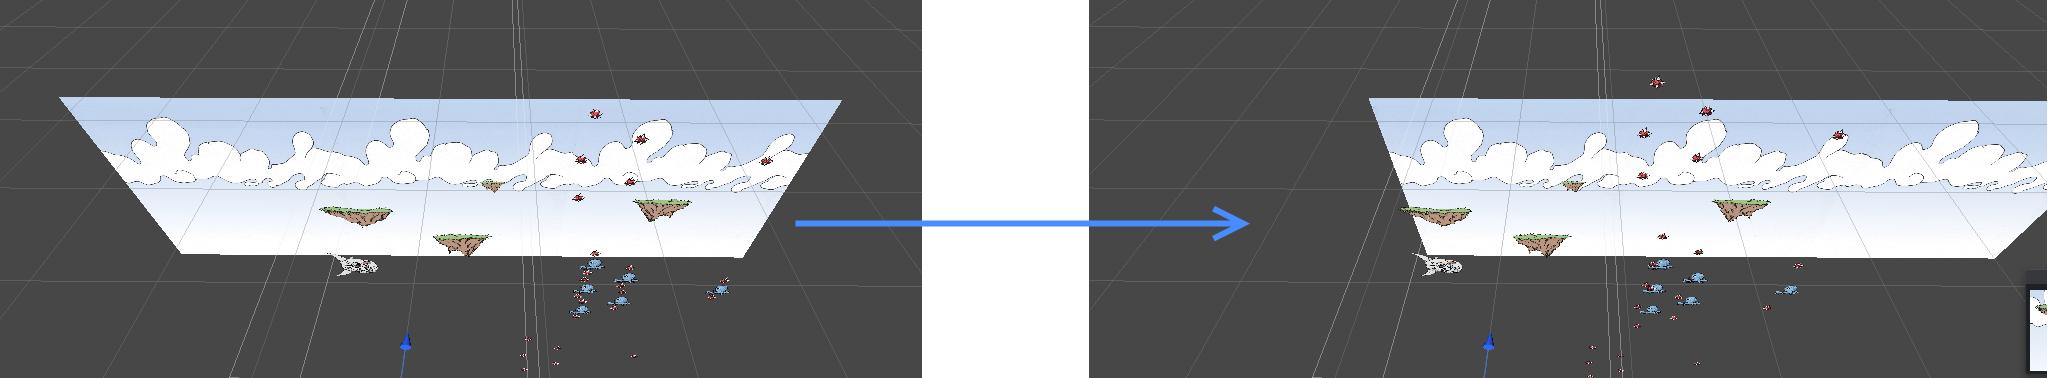 Parallax scrolling — Pixelnest Studio